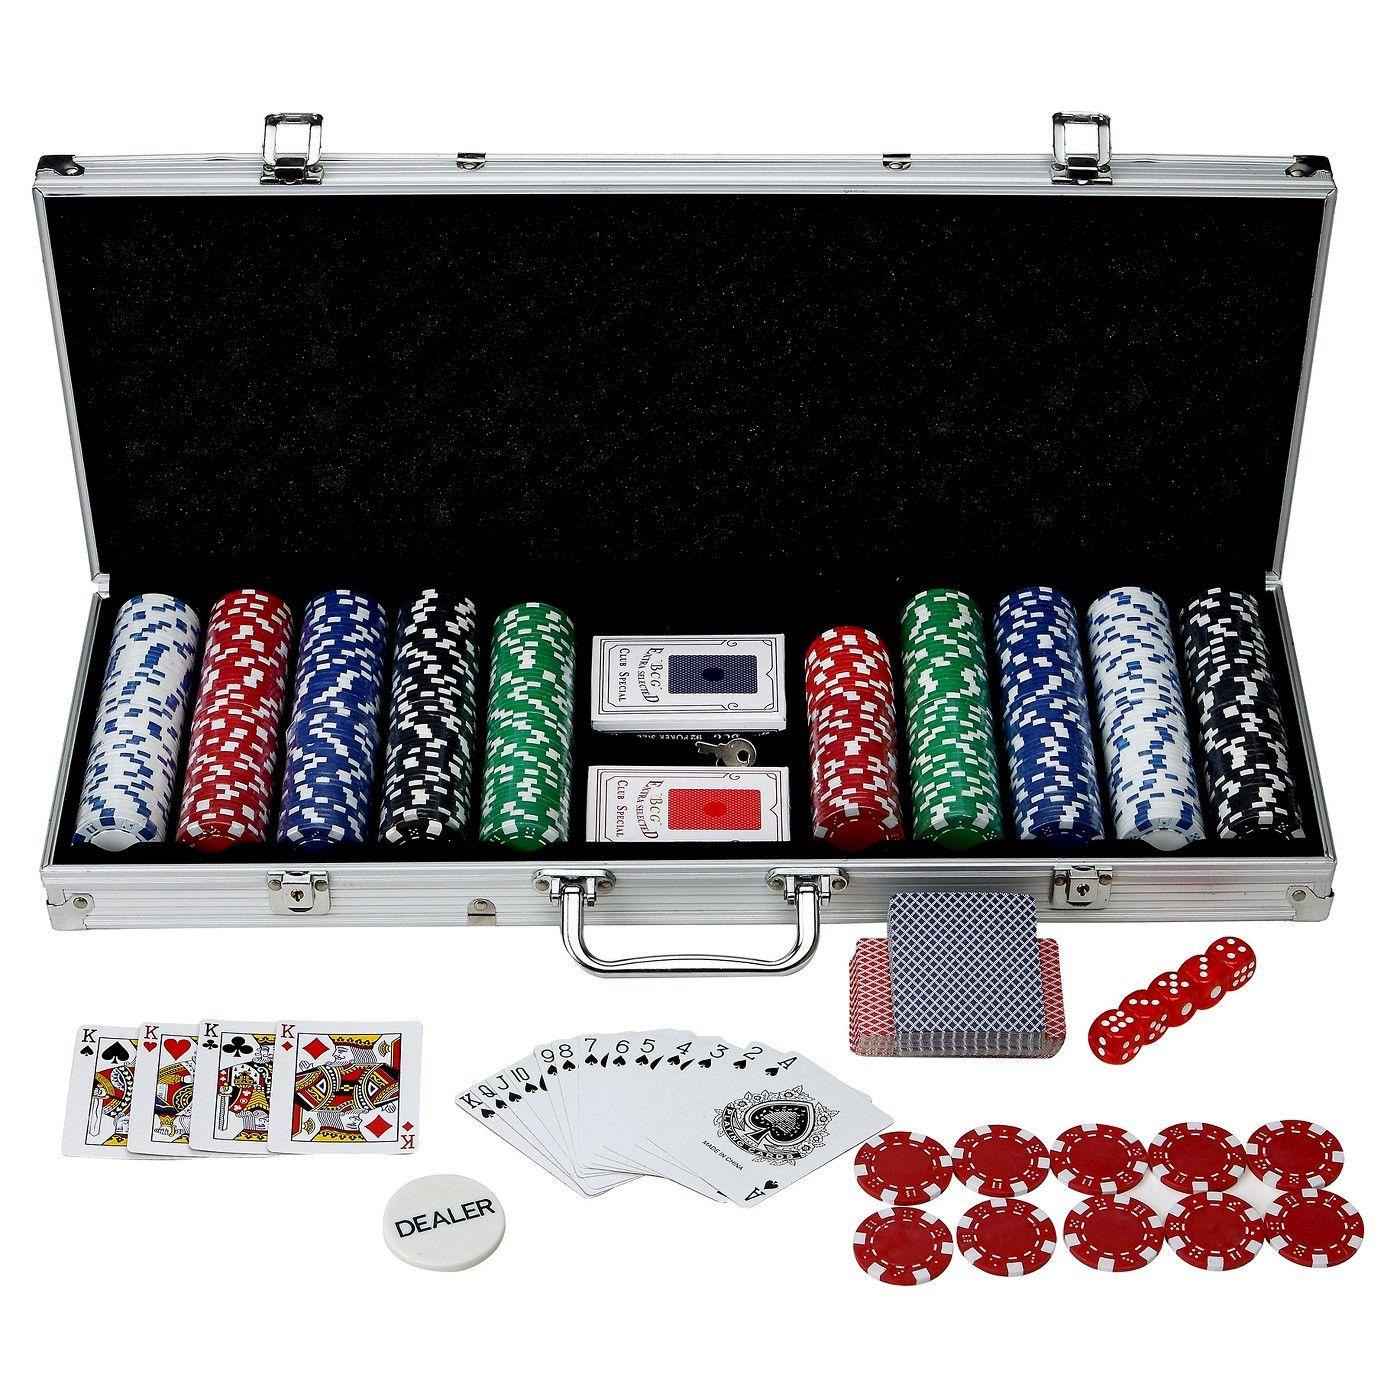 Hathaway monte carlo 500 piece poker set image 1 of 6